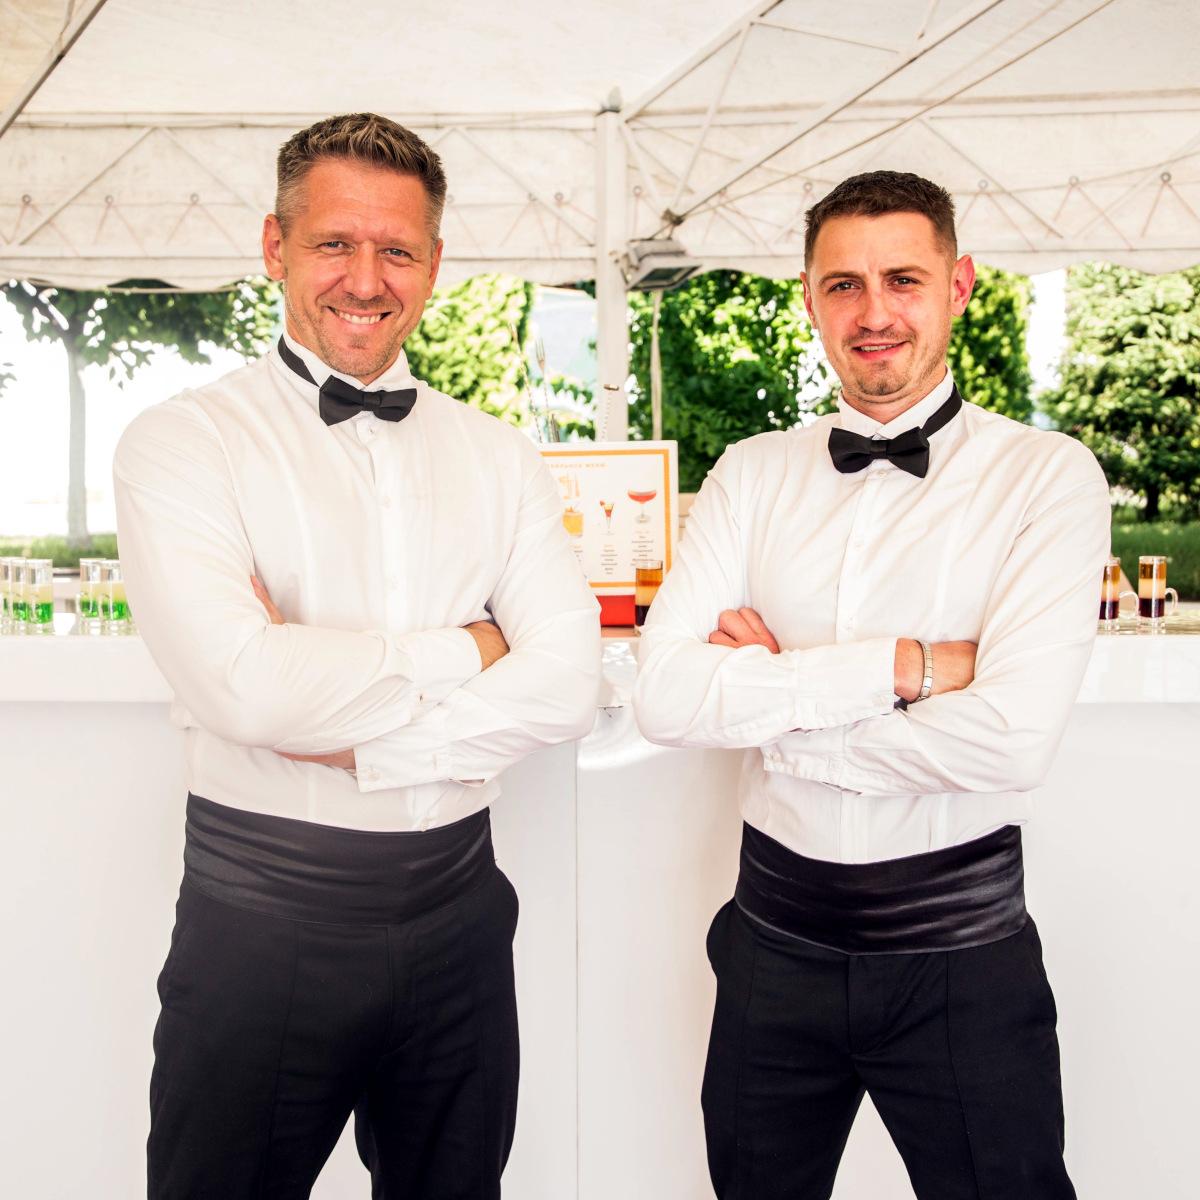 classic-white-shirt-black-bow-tie-01